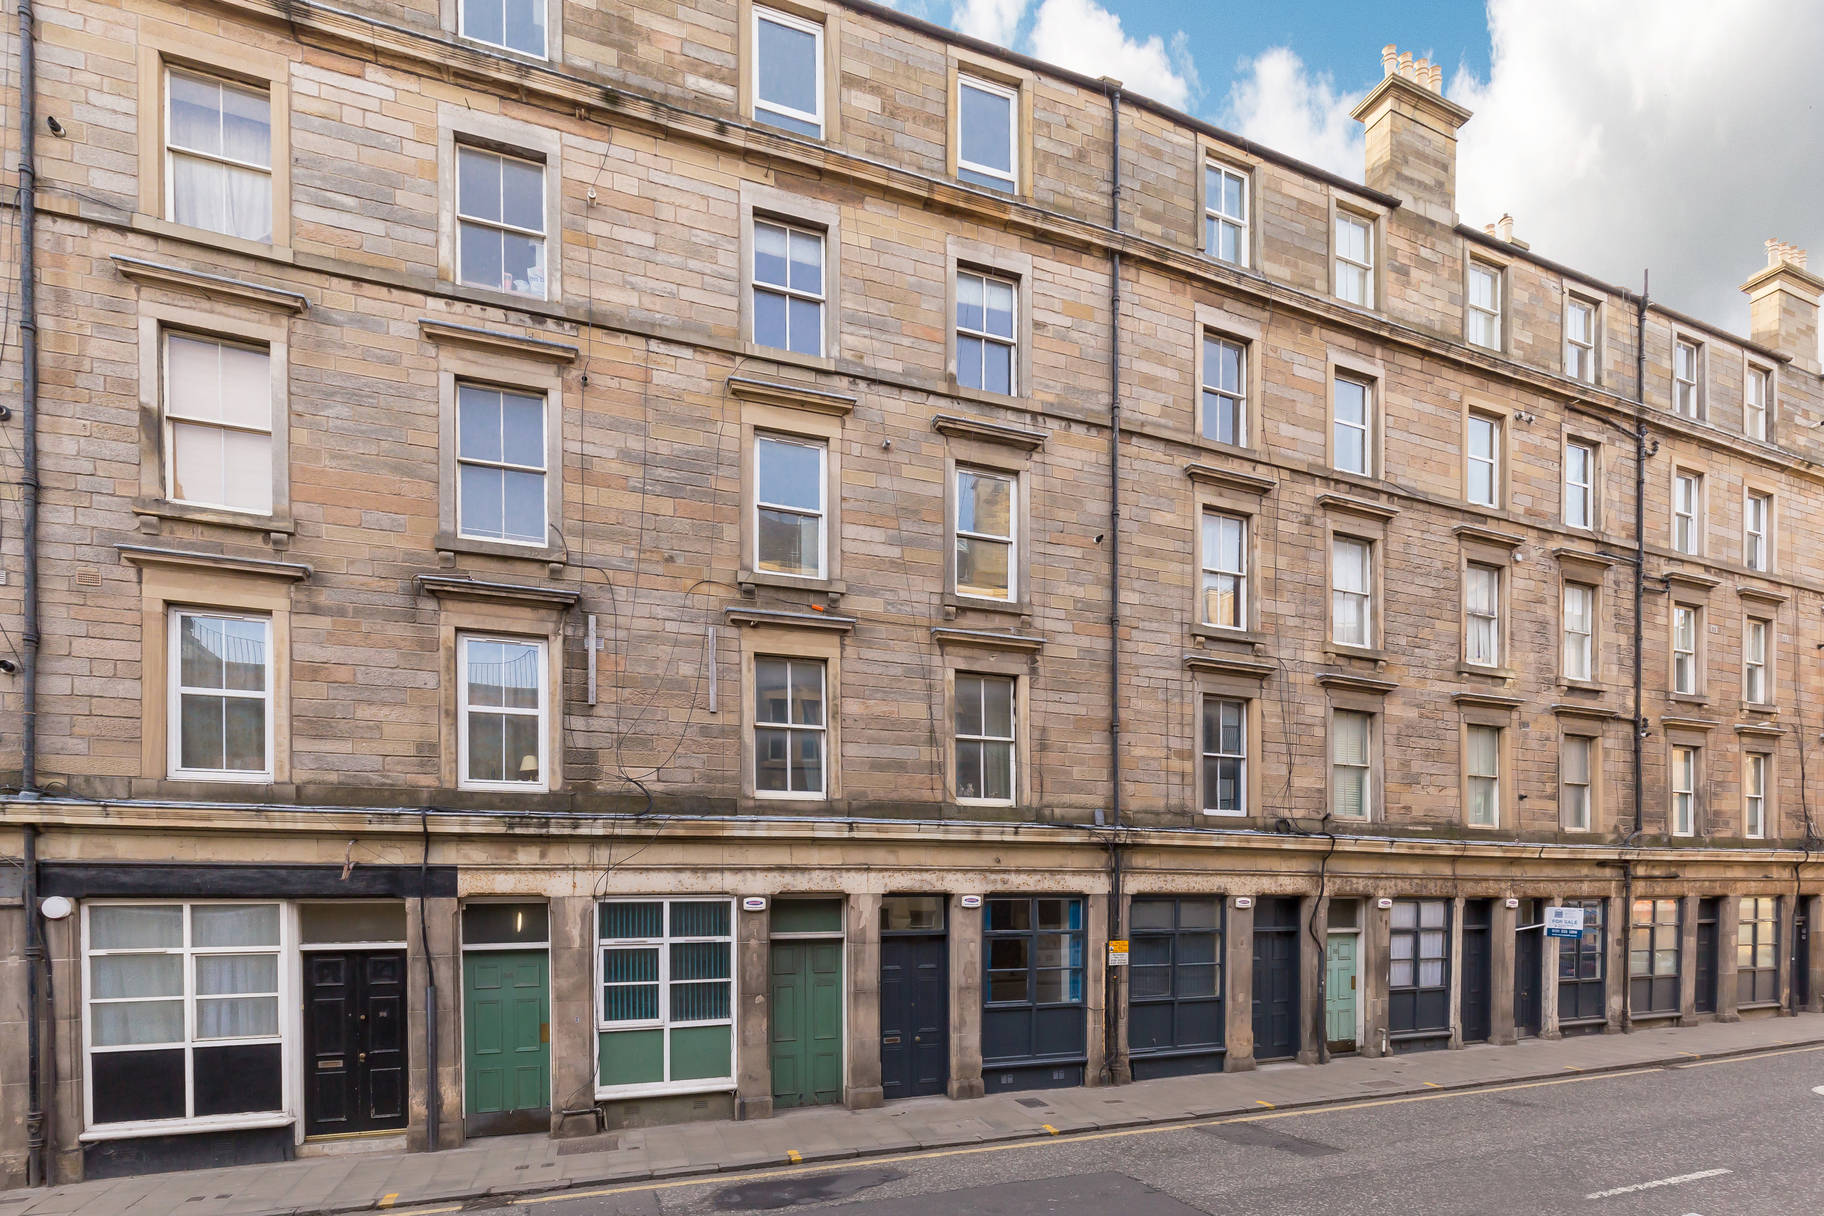 92 Duke Street, Leith, Edinburgh, EH6 8HL